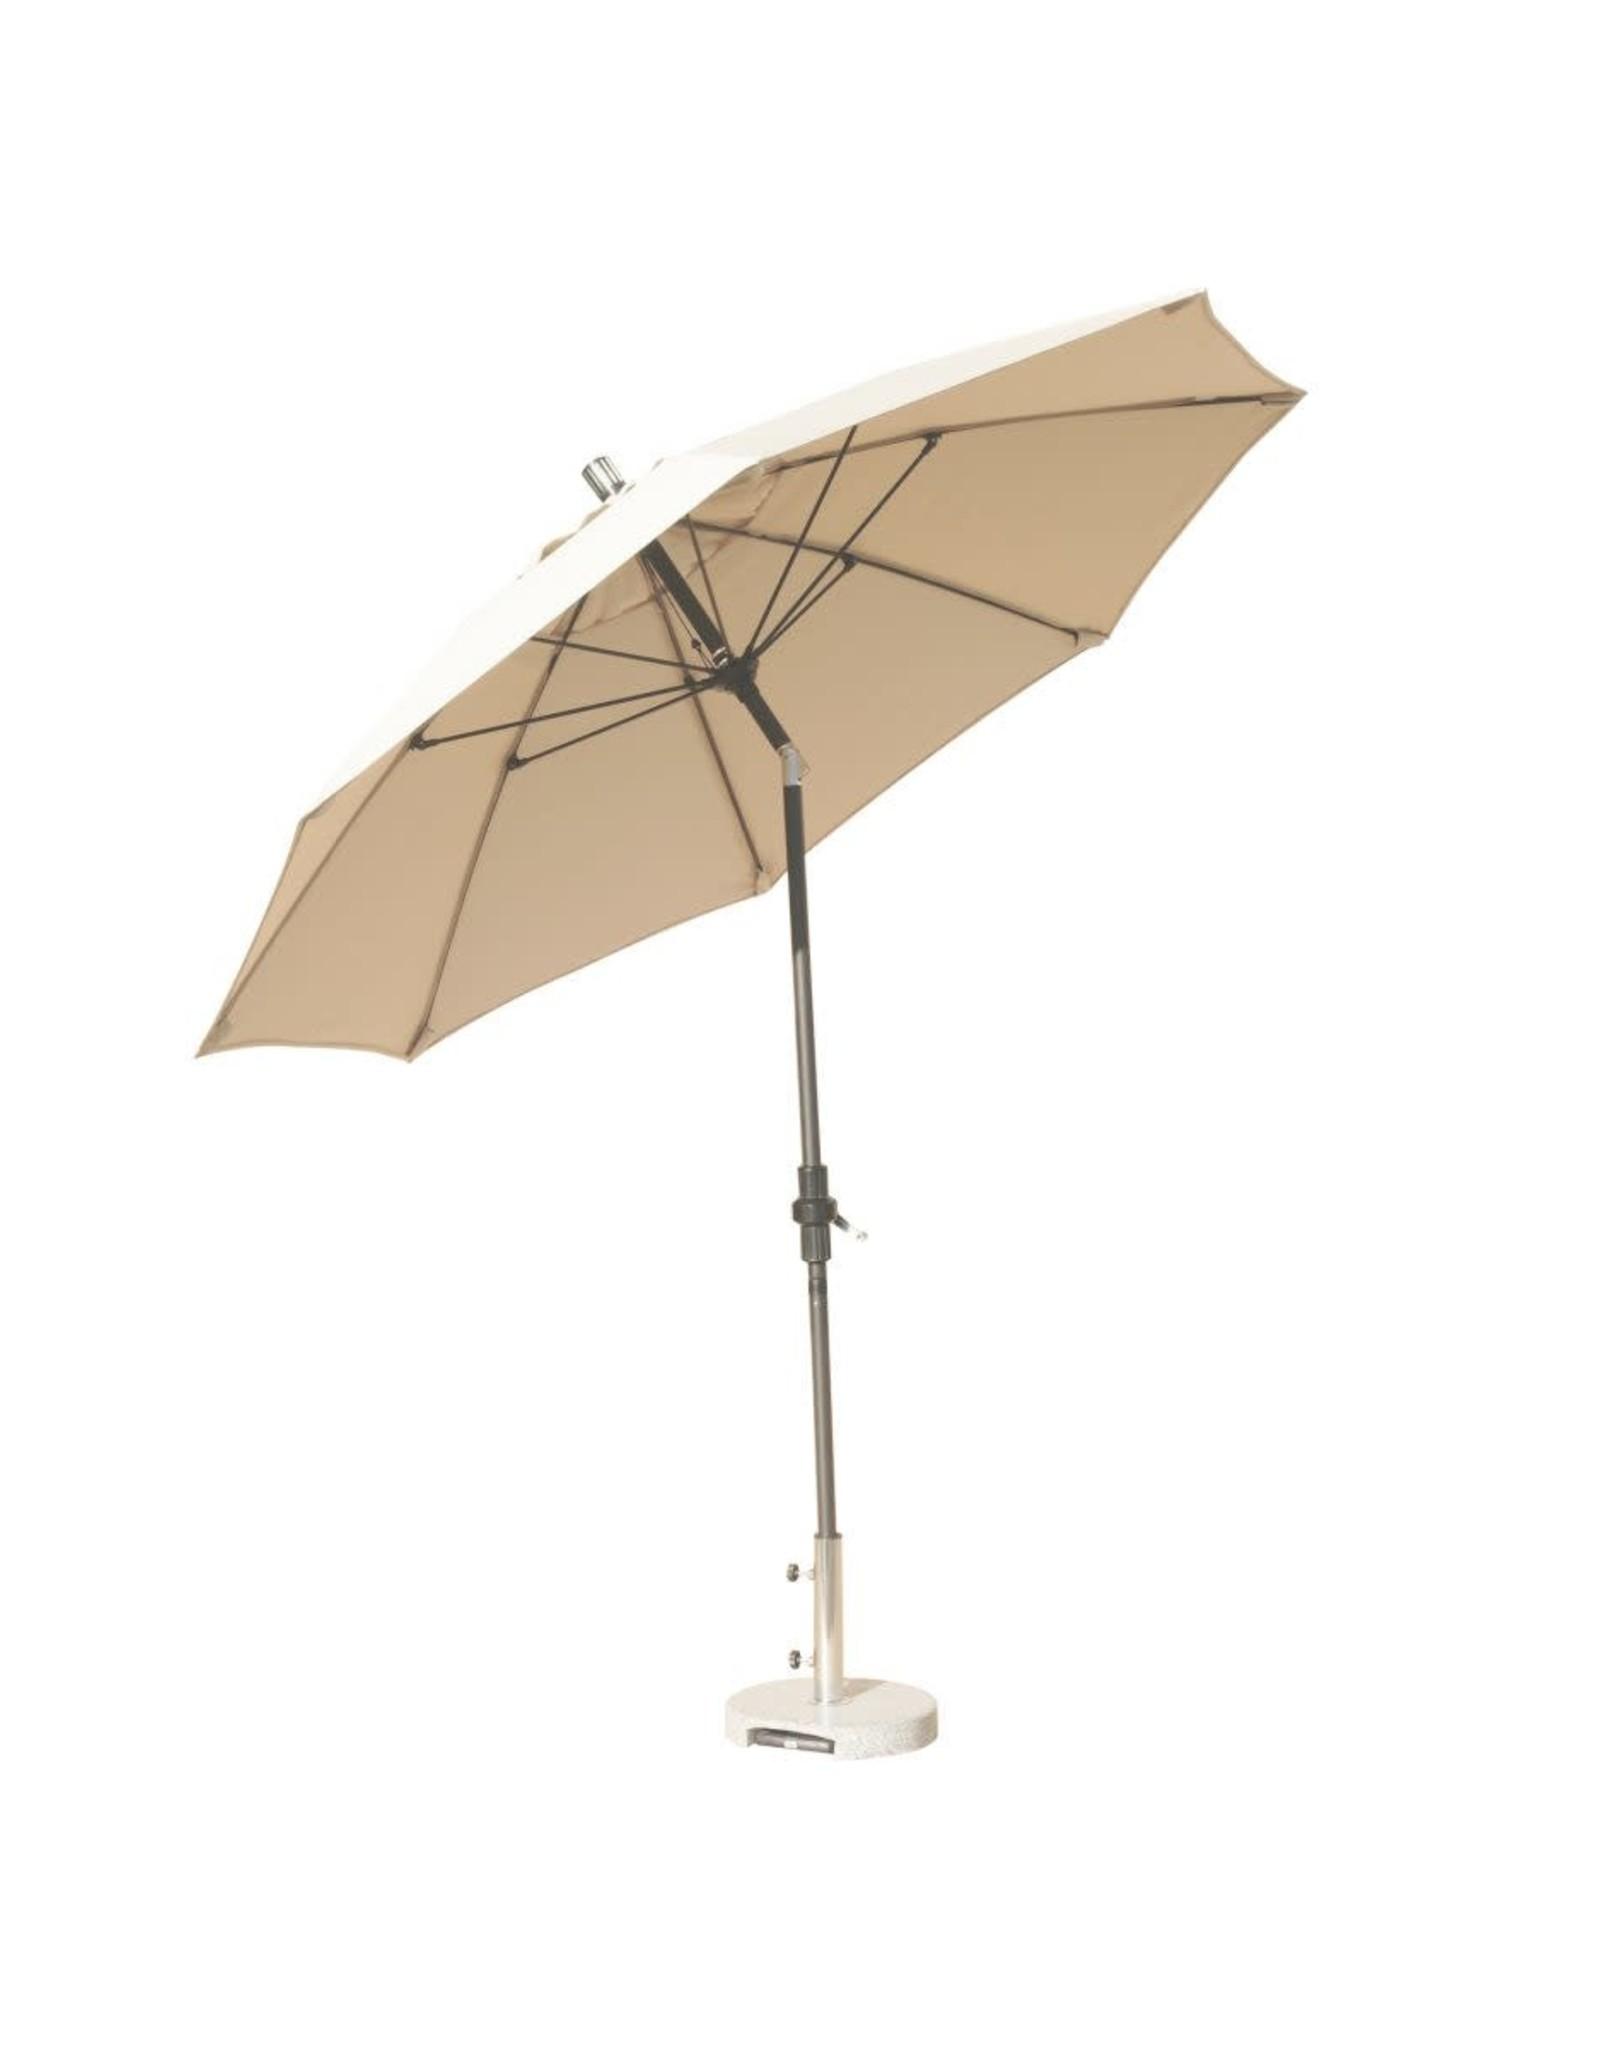 Ratana Ratana Umbrellas Tilt 9 FT UM00906